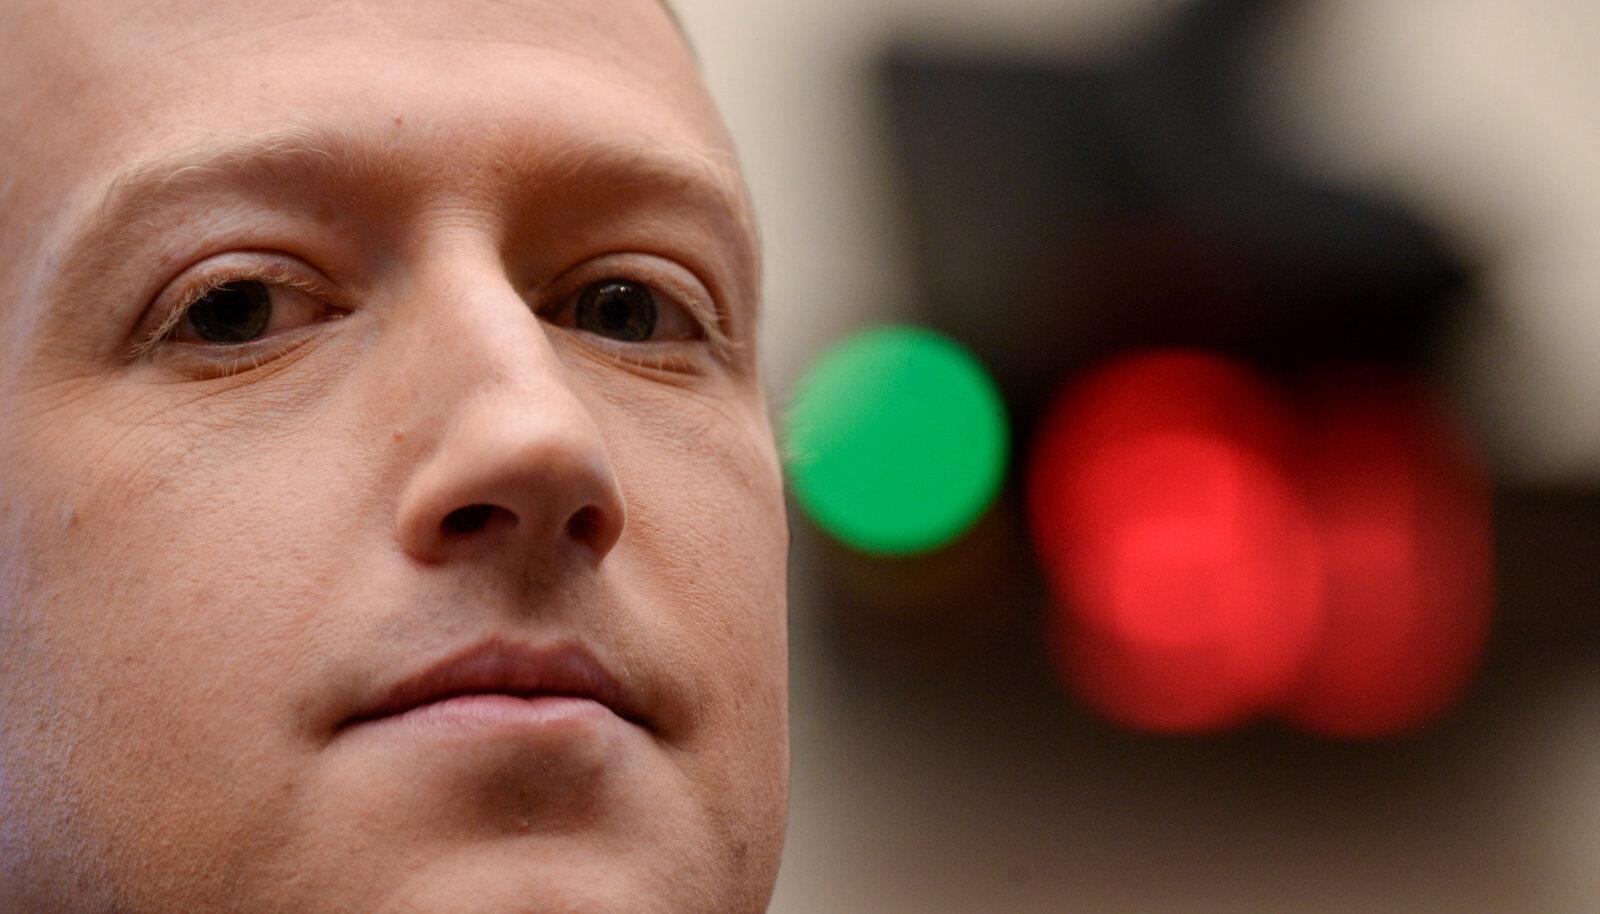 Mureliku näoga Facebooki kaasasutaja ja boss Mark Zuckerberg (foto: REUTERS / Scanpix)